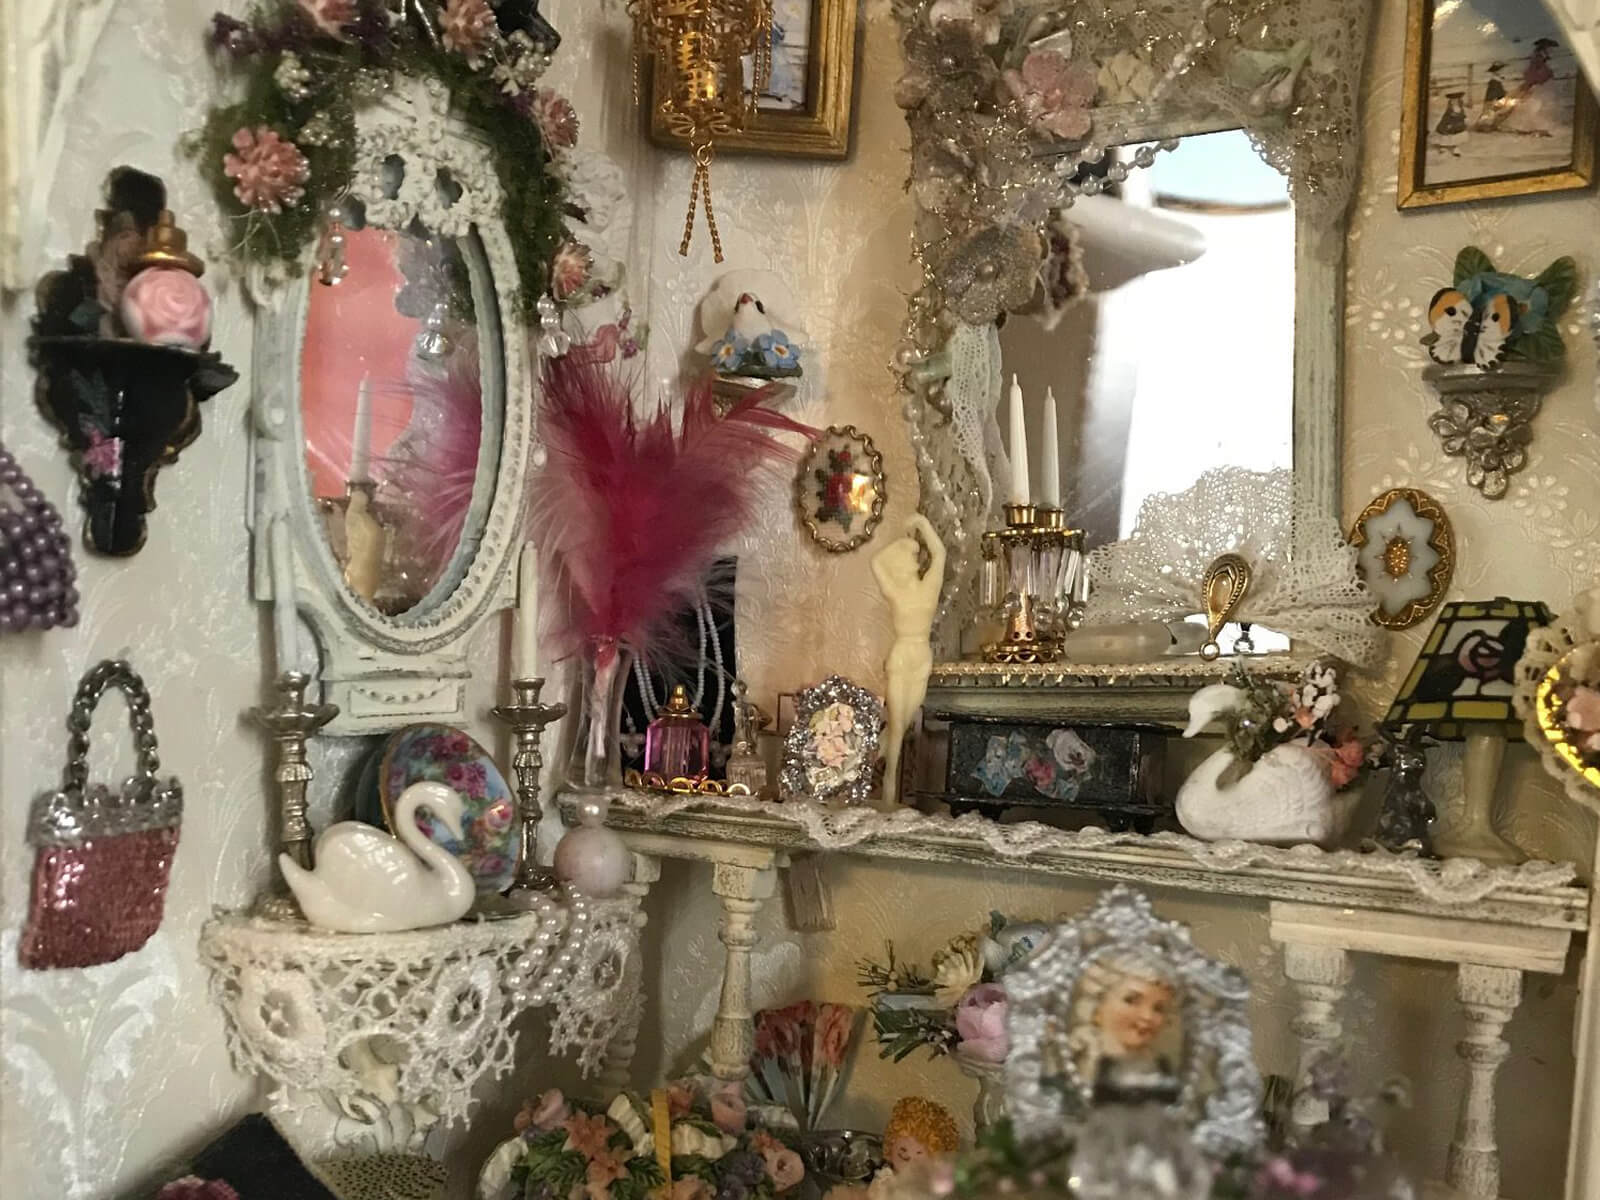 Preparing for the New Season – Dollshouse interior at Layer Marney Tower